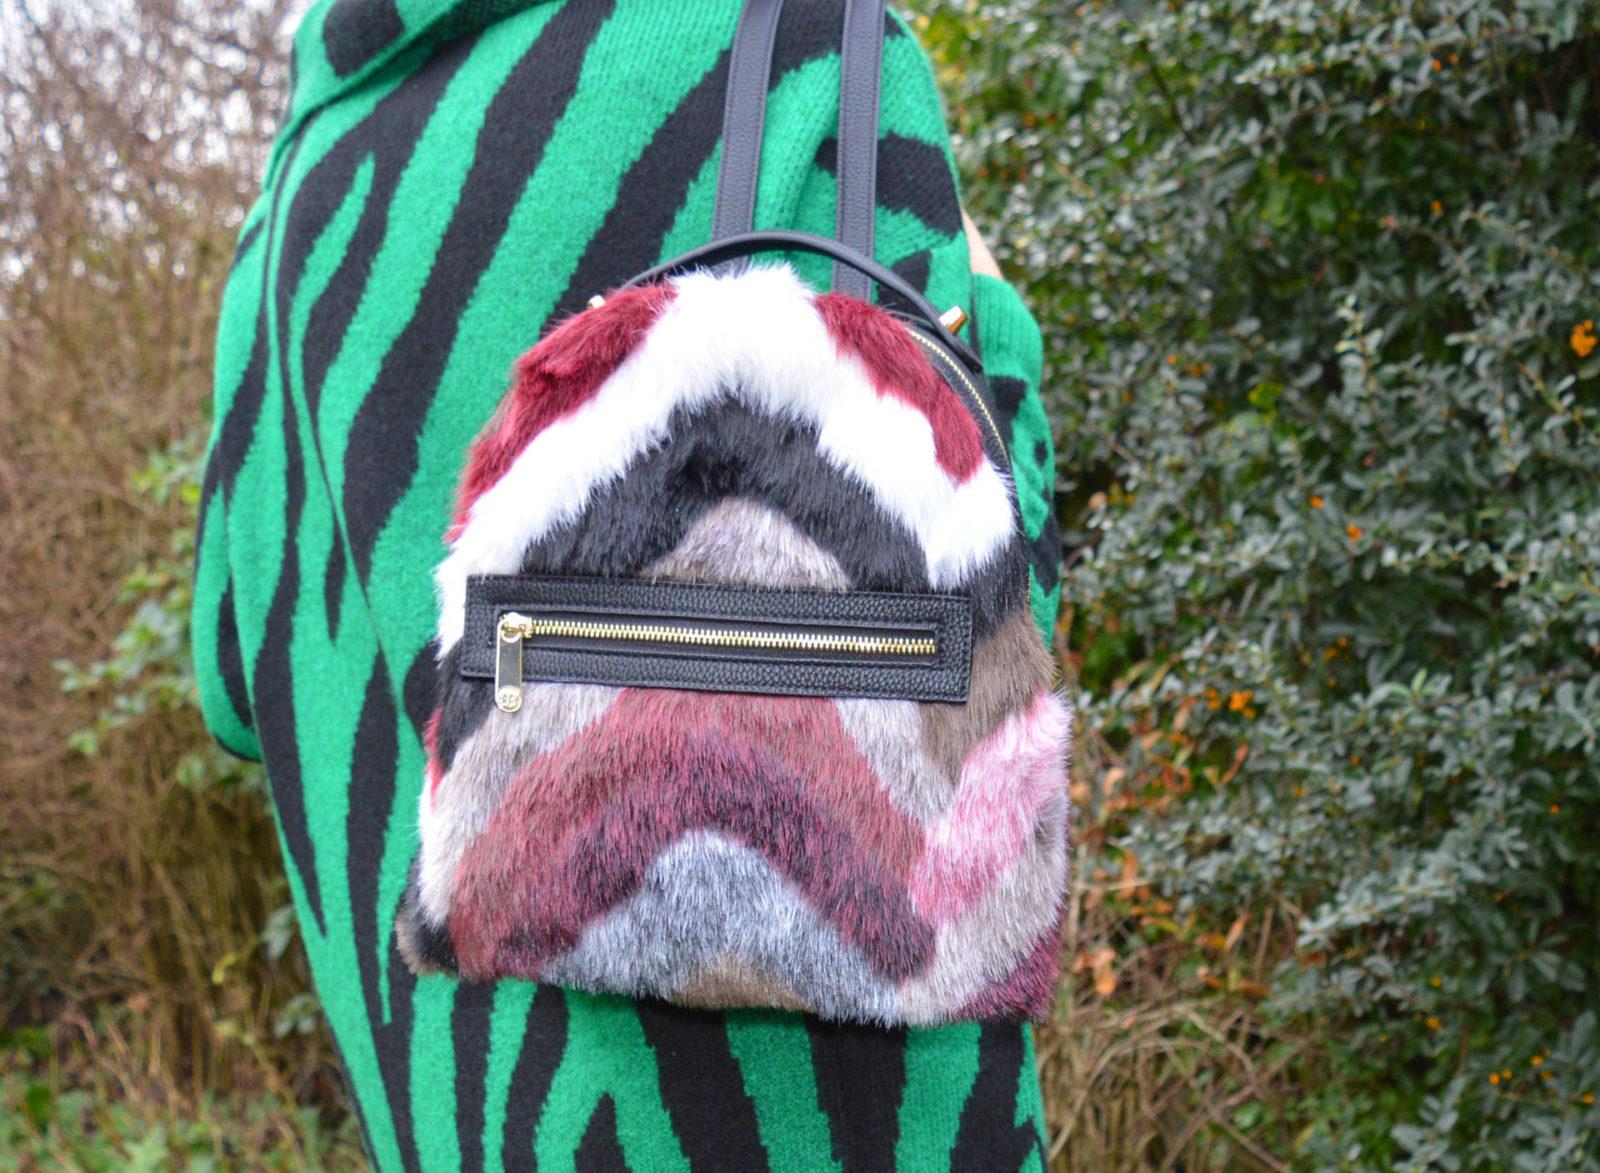 Bonmarche Green zebra print tunic jumper, faux fur backpack